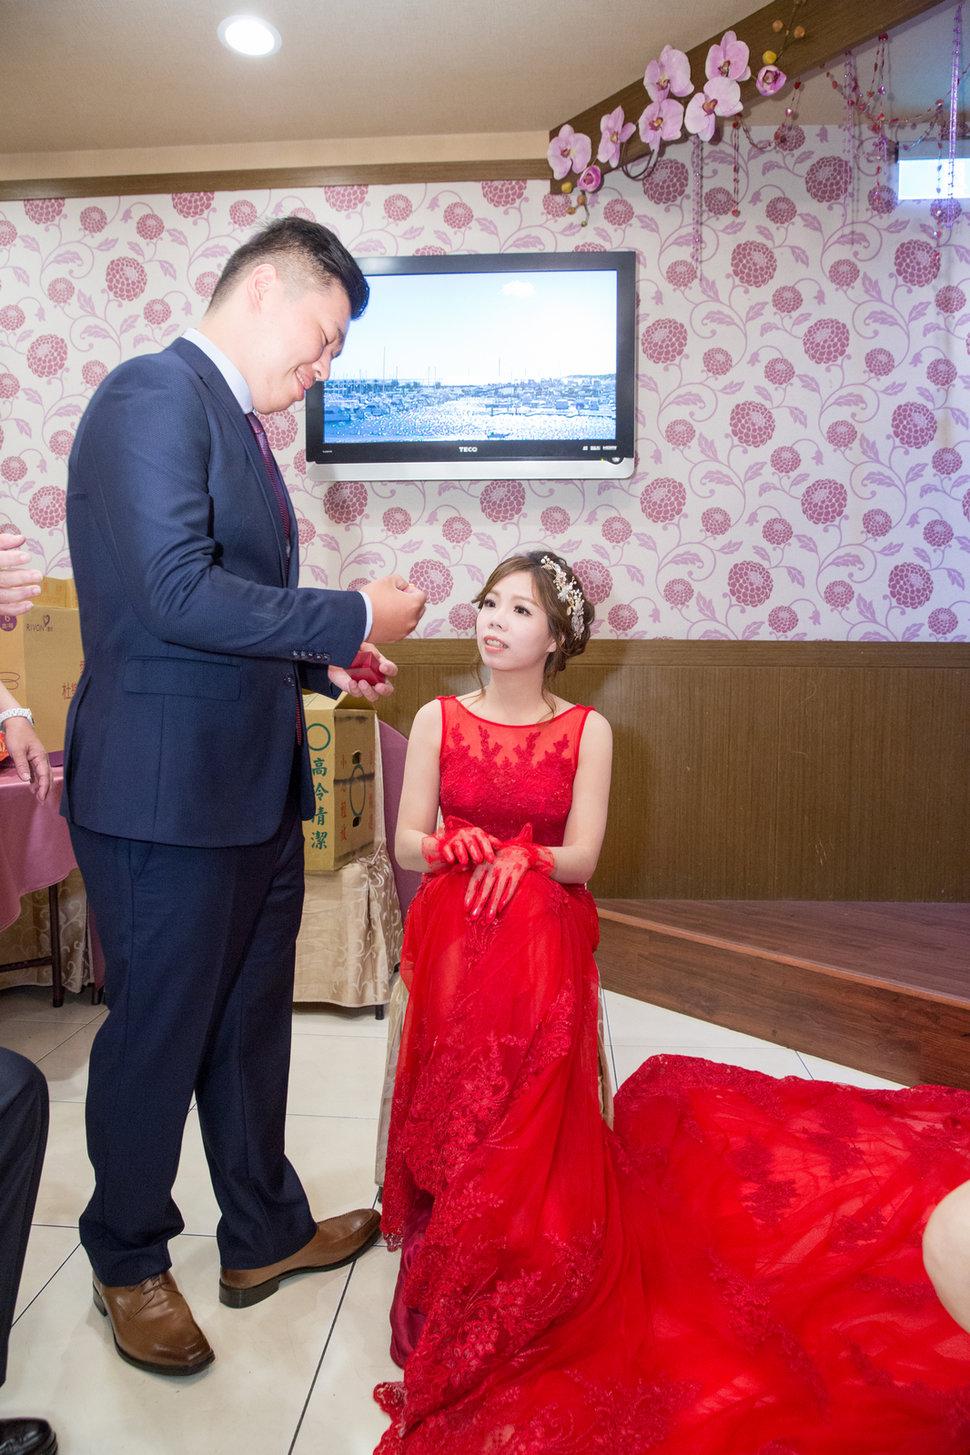 HANK9538 - 蛋拔婚禮紀錄 - 結婚吧